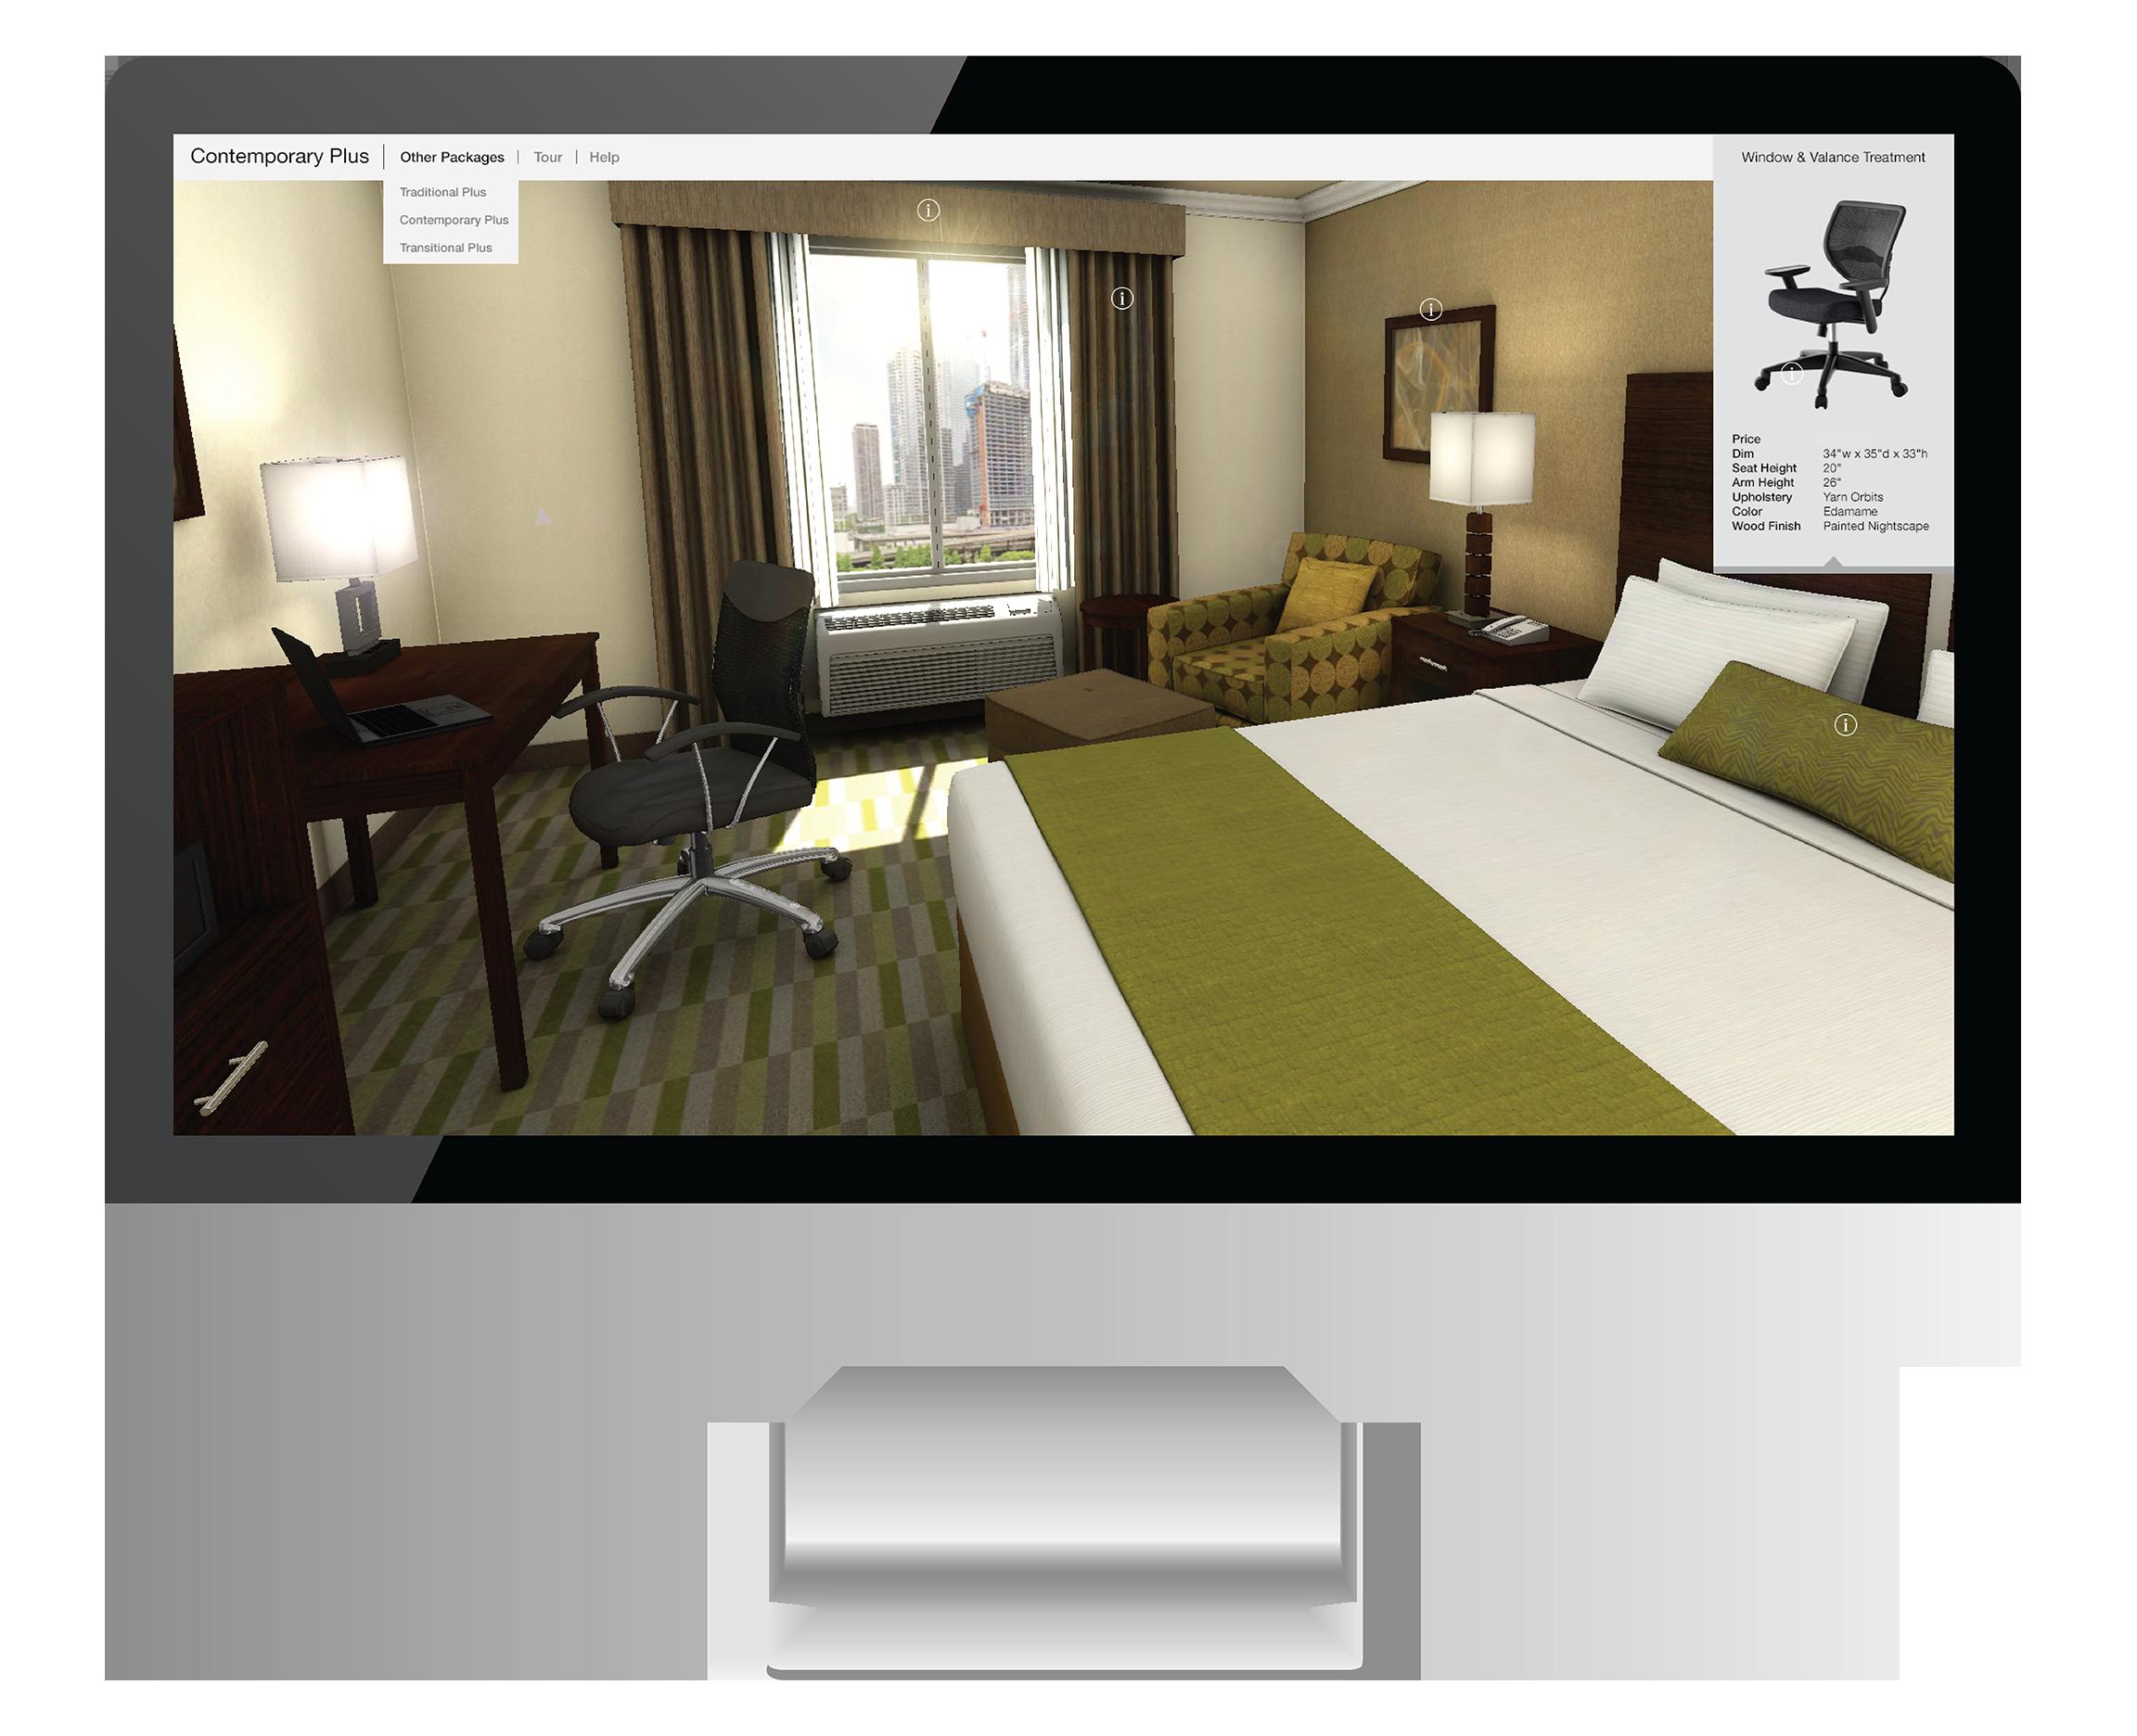 asteriskos-design-cg-render-bestwestern-hotel-realistic-photorealistic-interior-architecture-product-menu-app-unity-userinterface-realtime-interactive.png